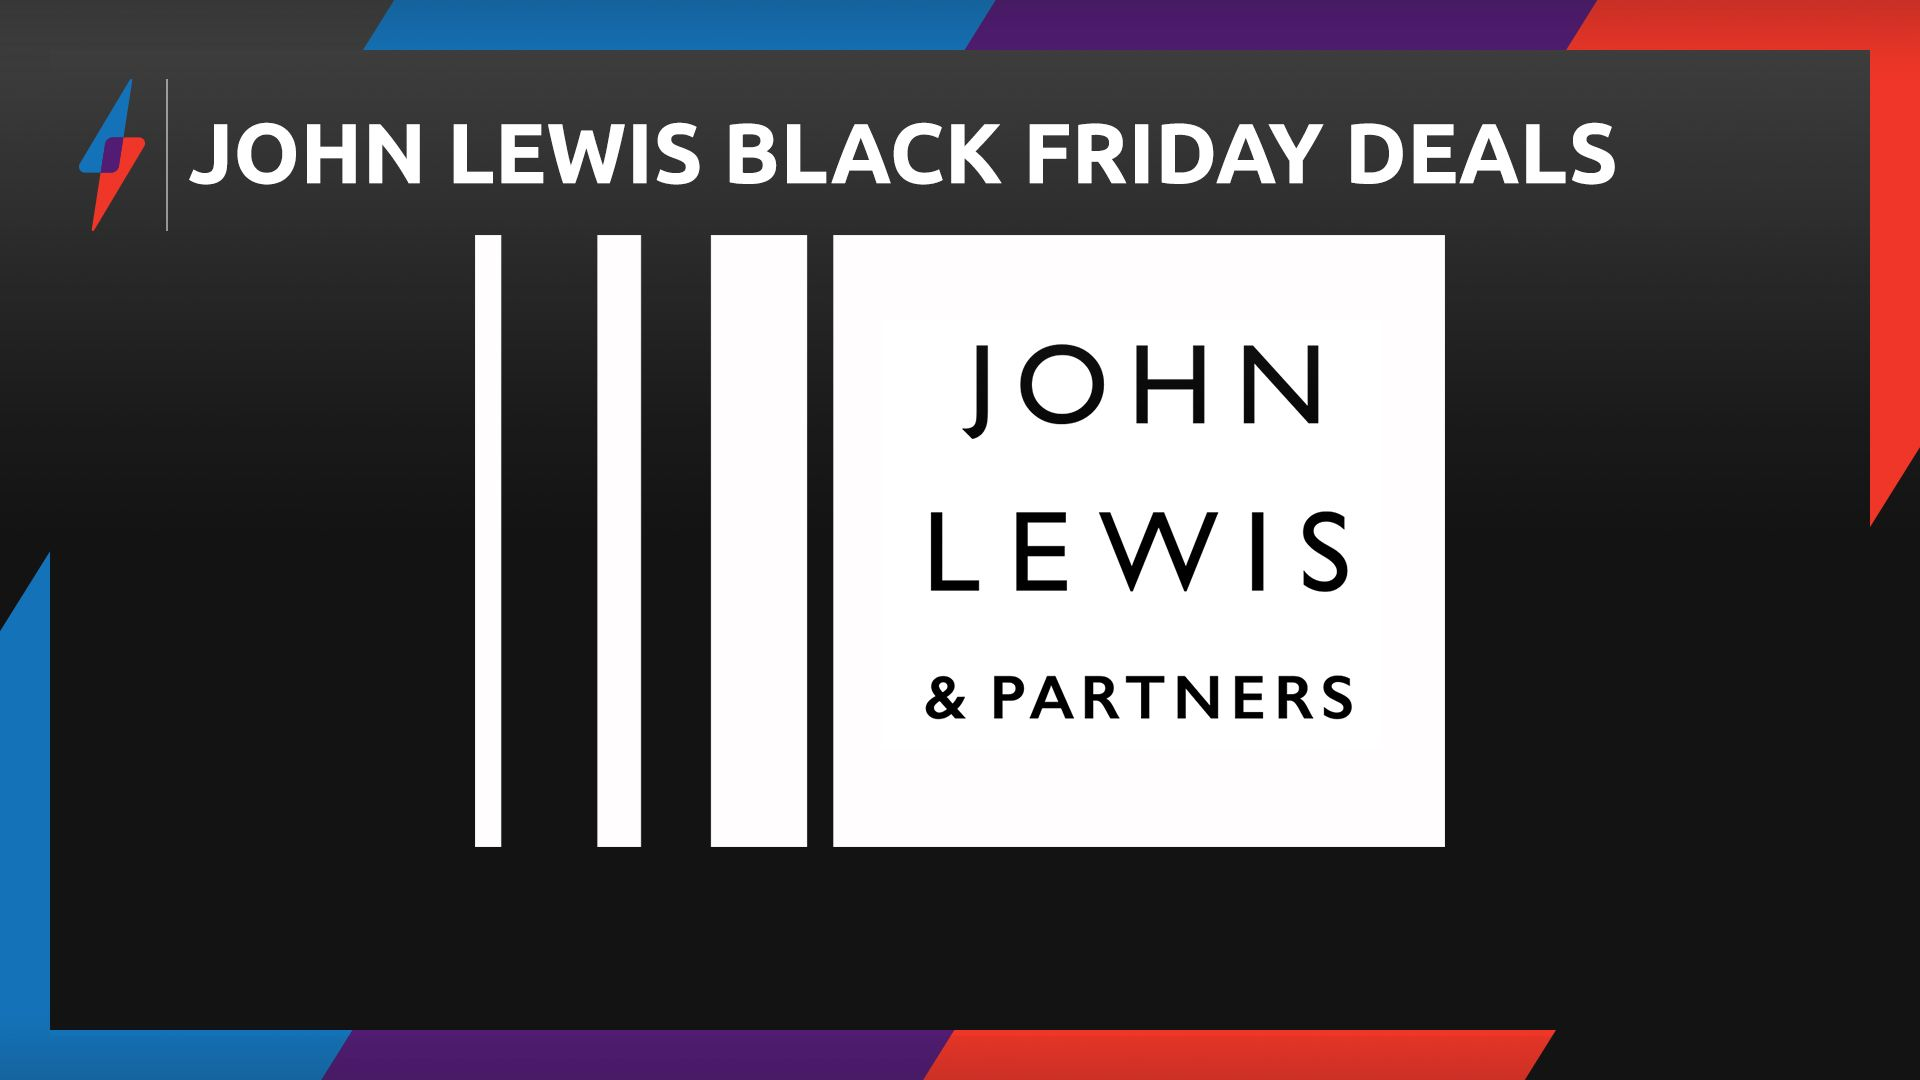 John Lewis Black Friday Deals John Lewis Black Friday Deals Black Friday 2019 Is Always Black Friday Laptop Deals Black Friday Laptop Black Friday Tv Deals